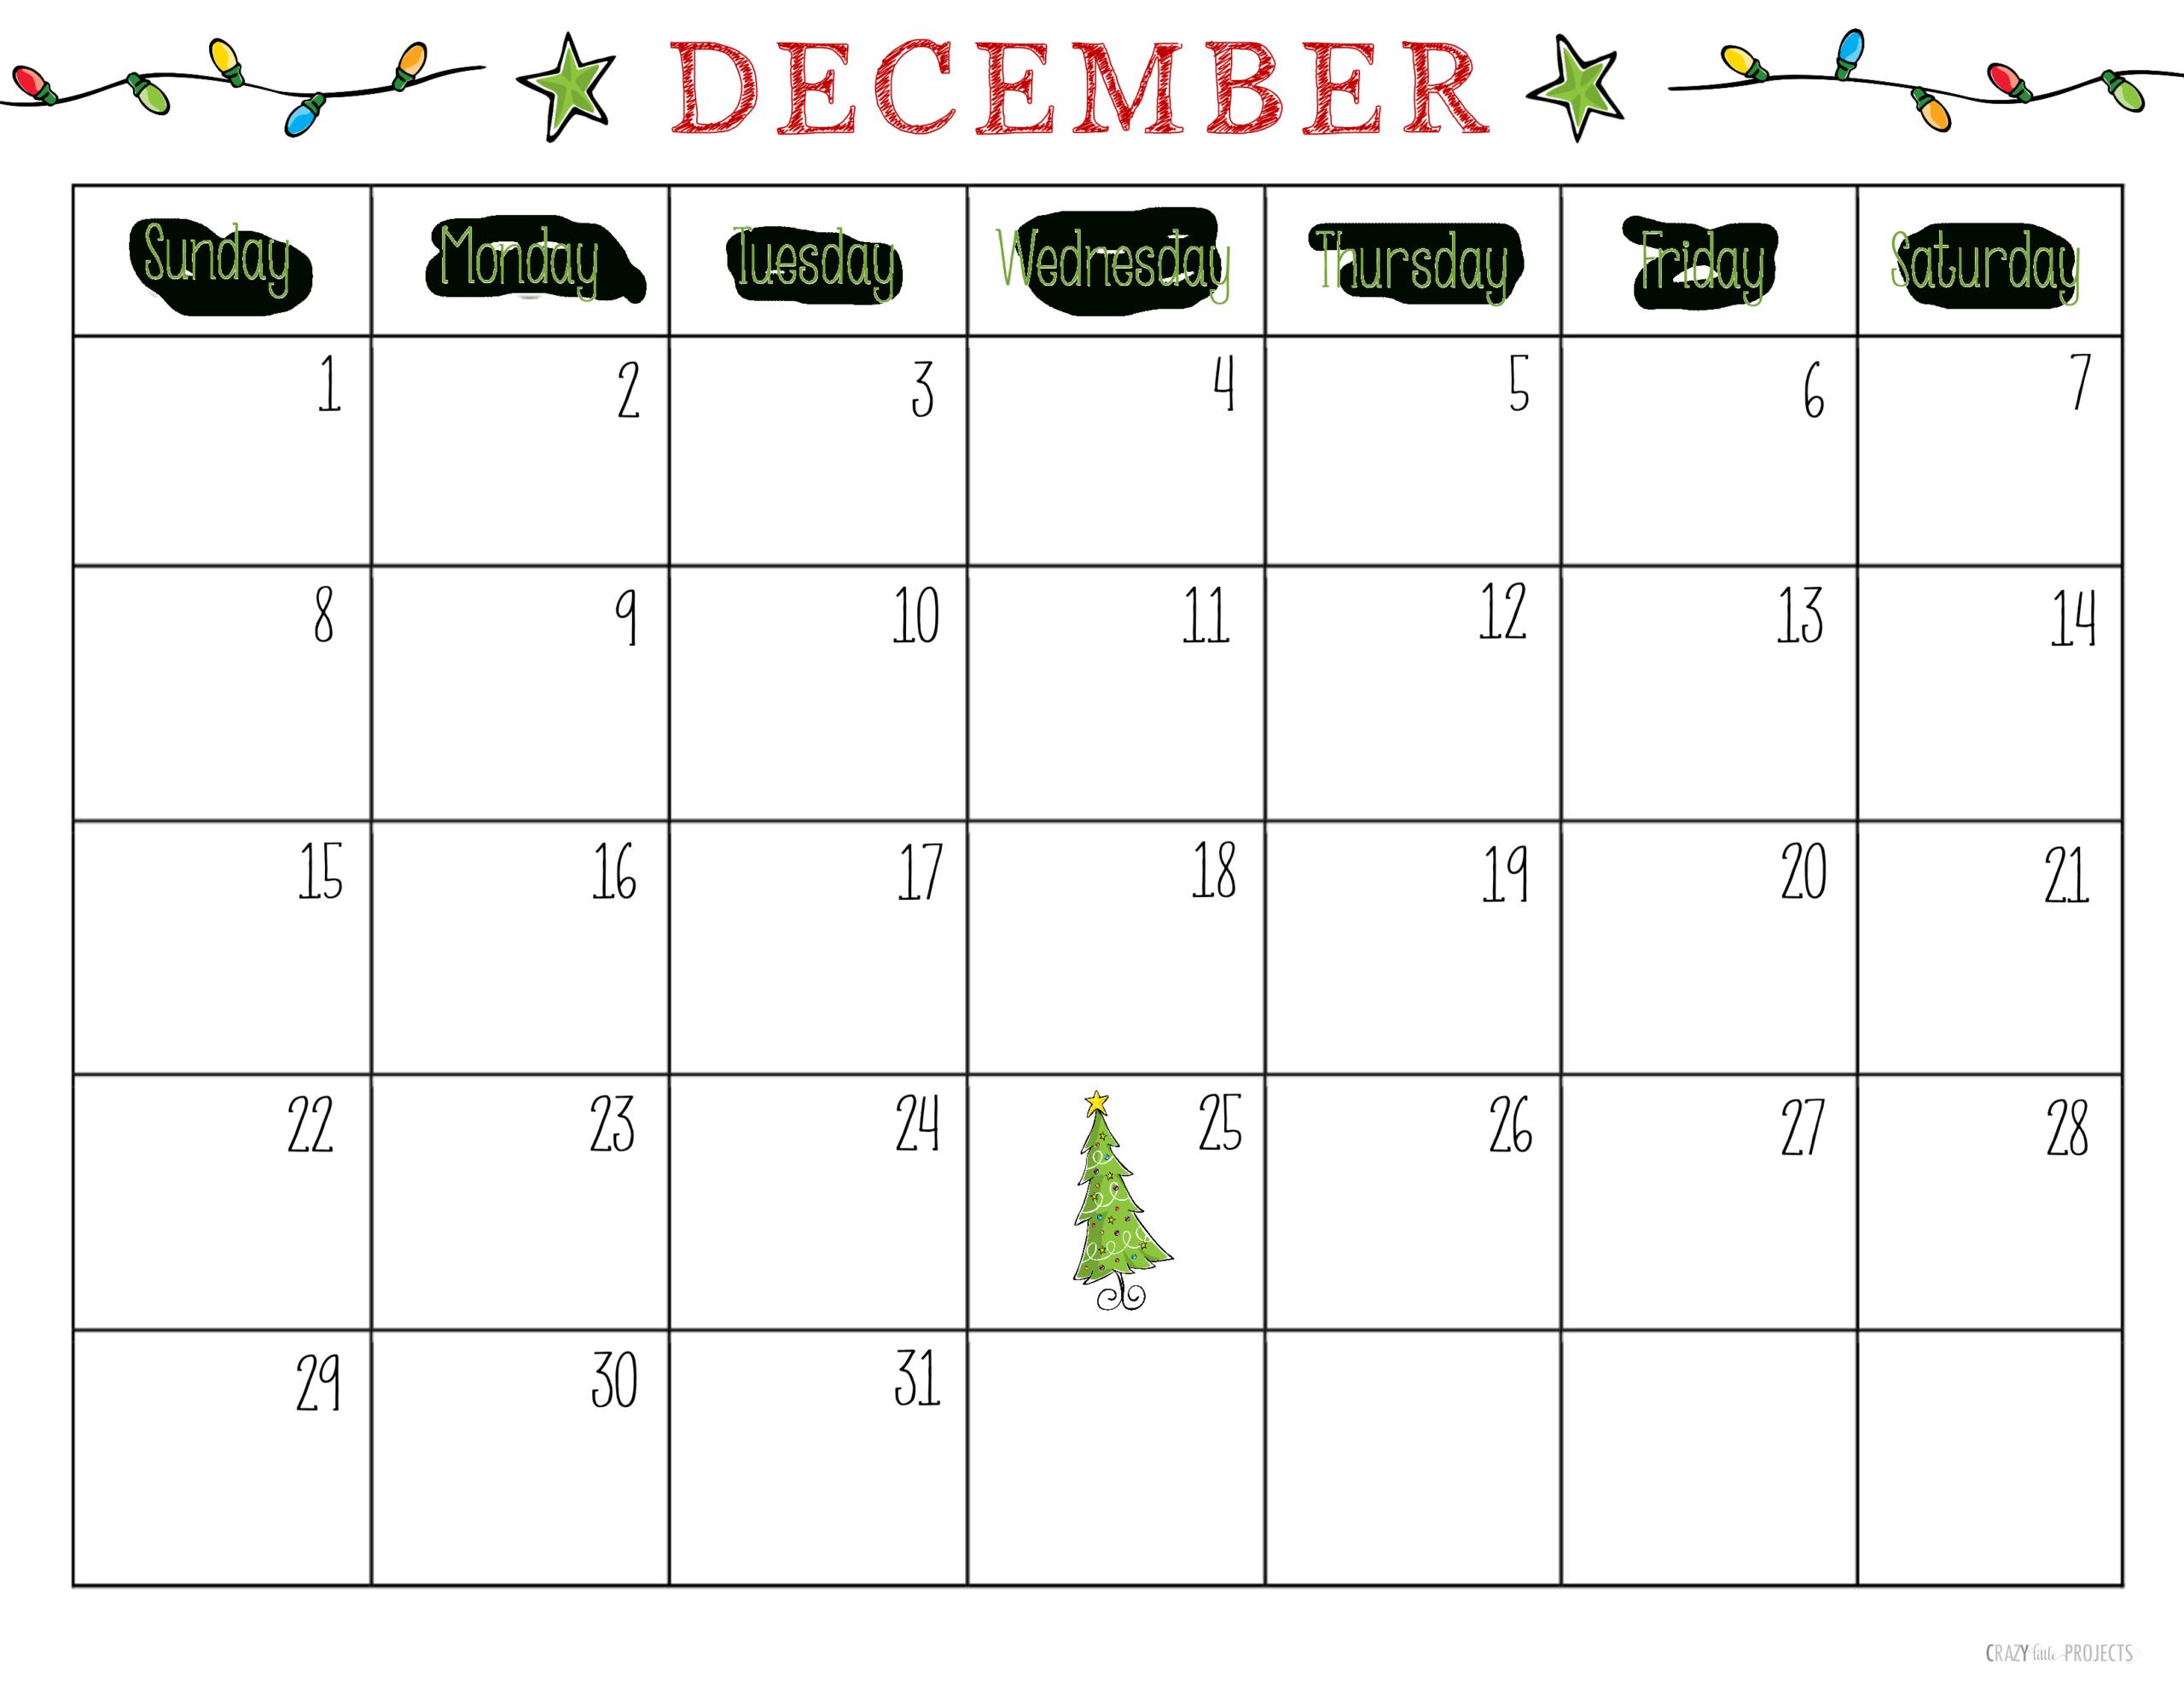 Free Printable Christmas Planner | Printable December